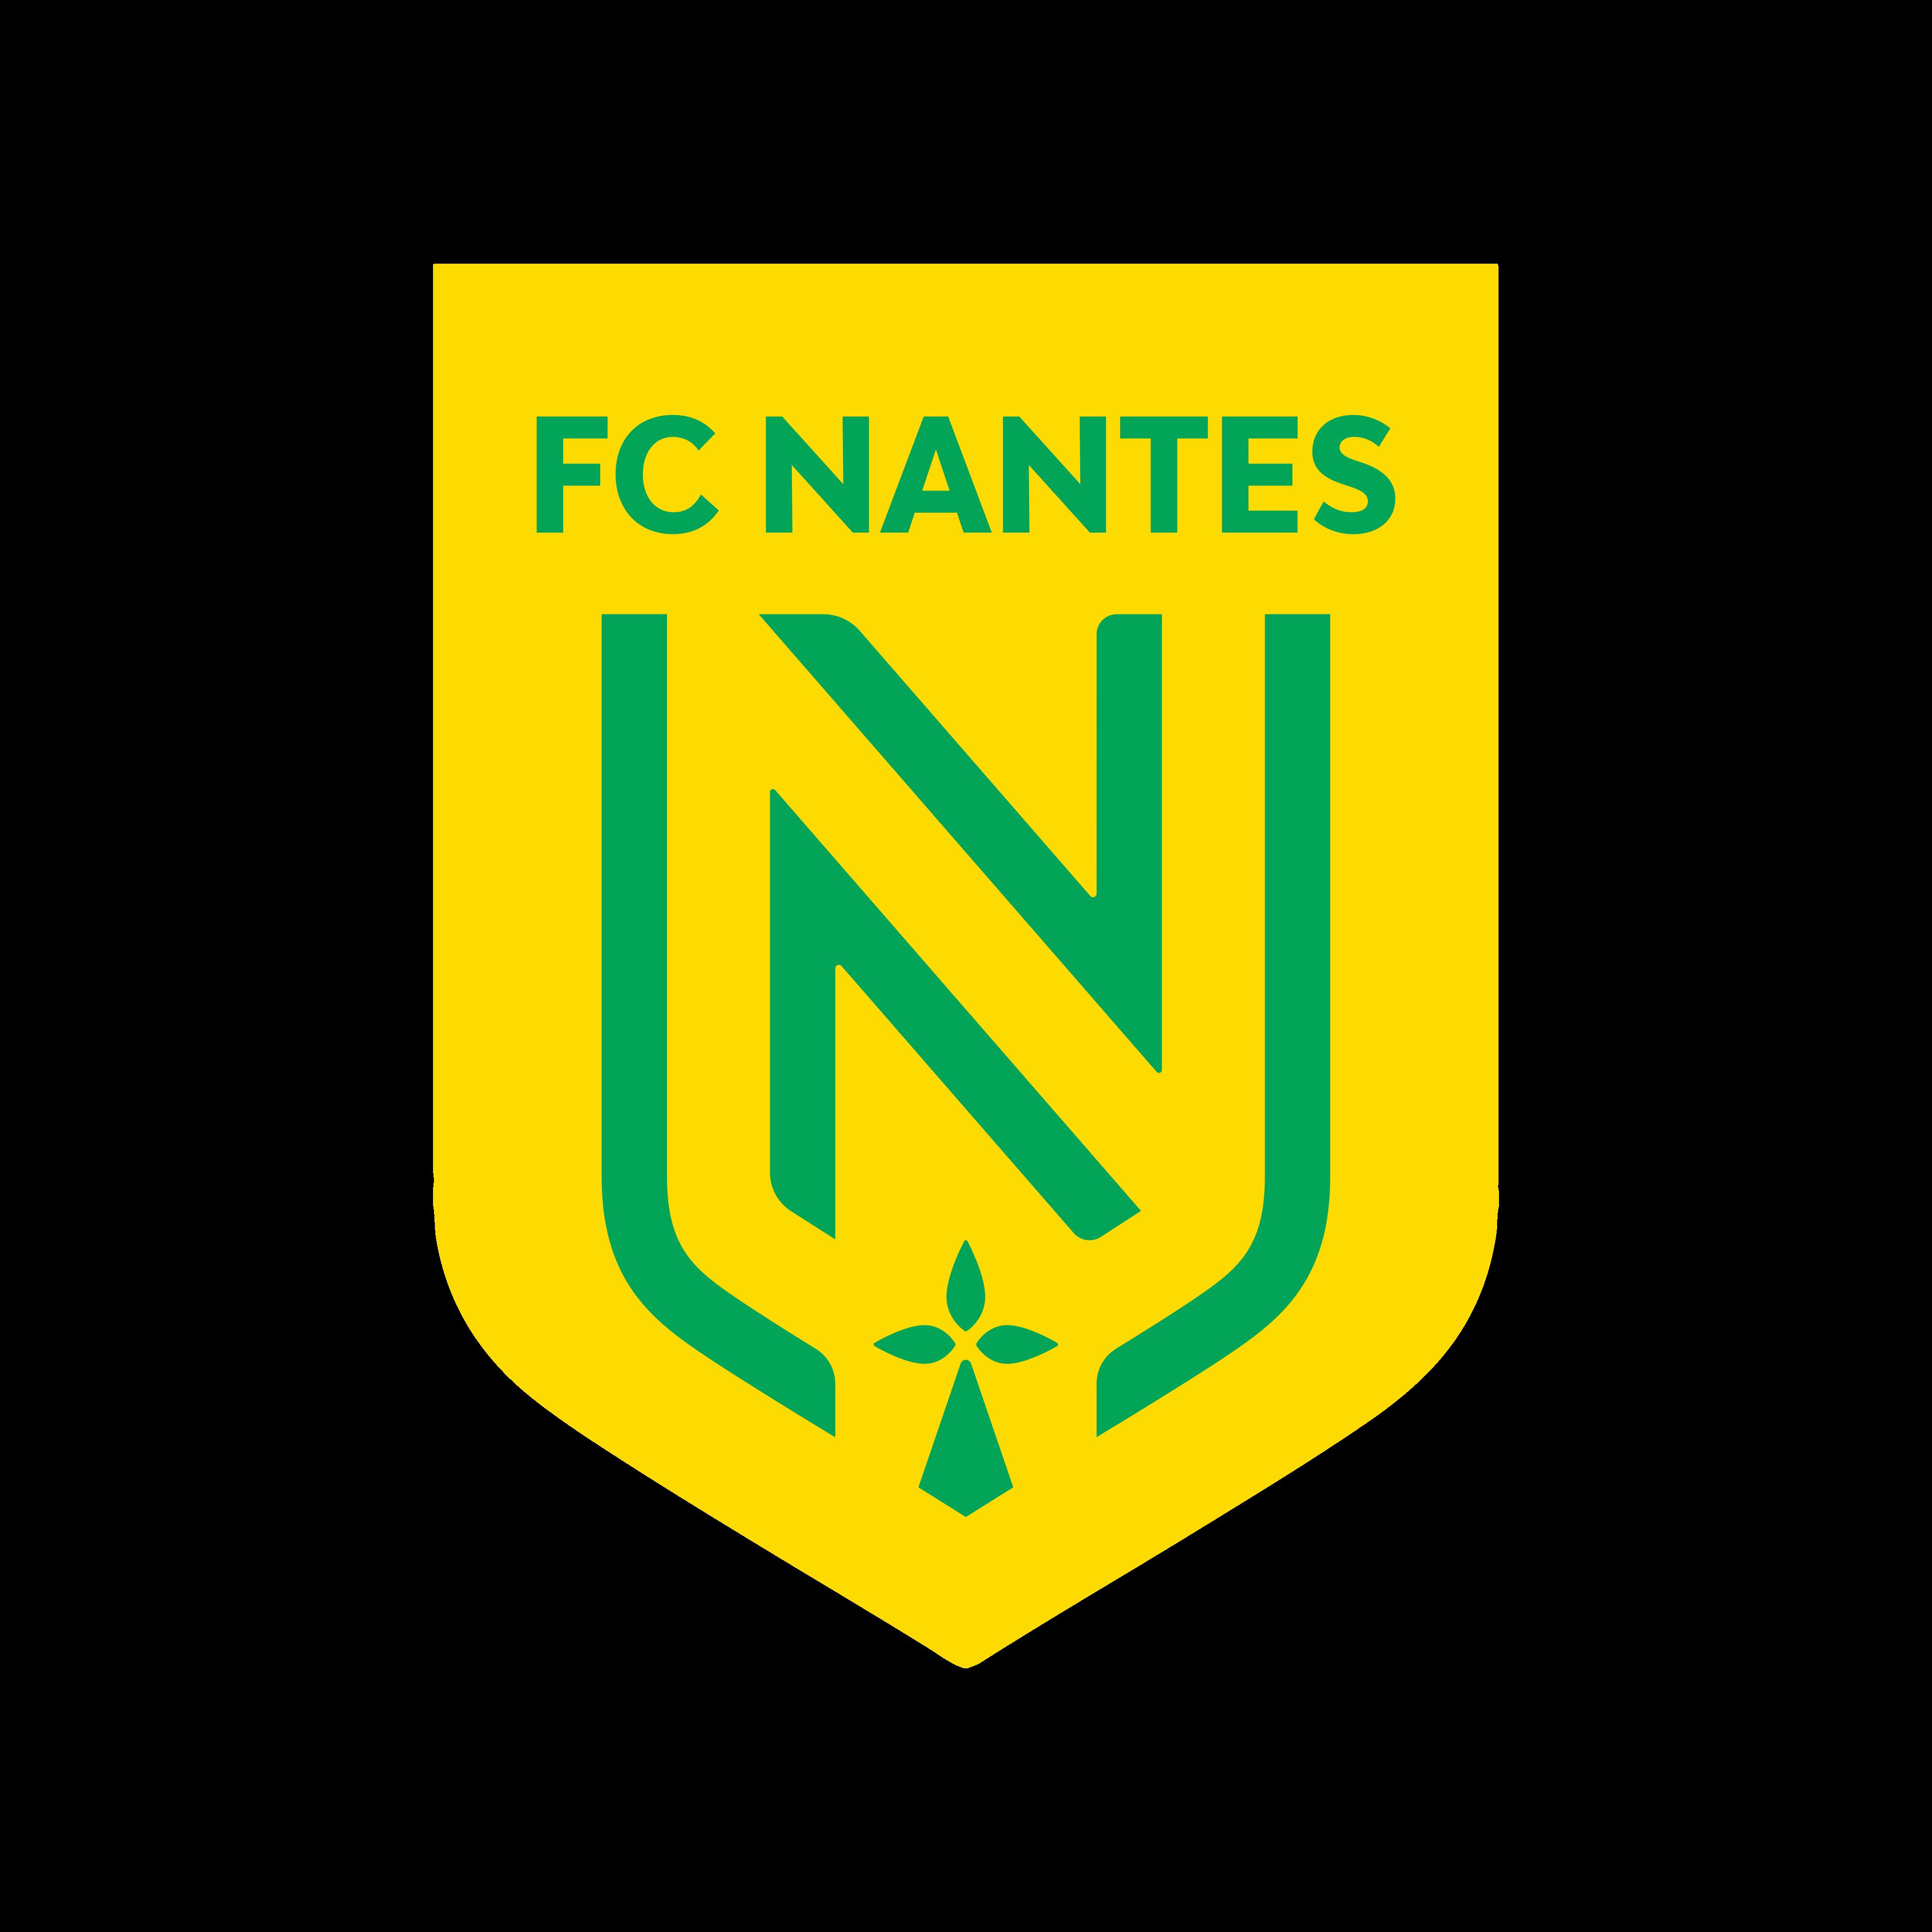 nantes fc logo 0 - FC Nantes Logo